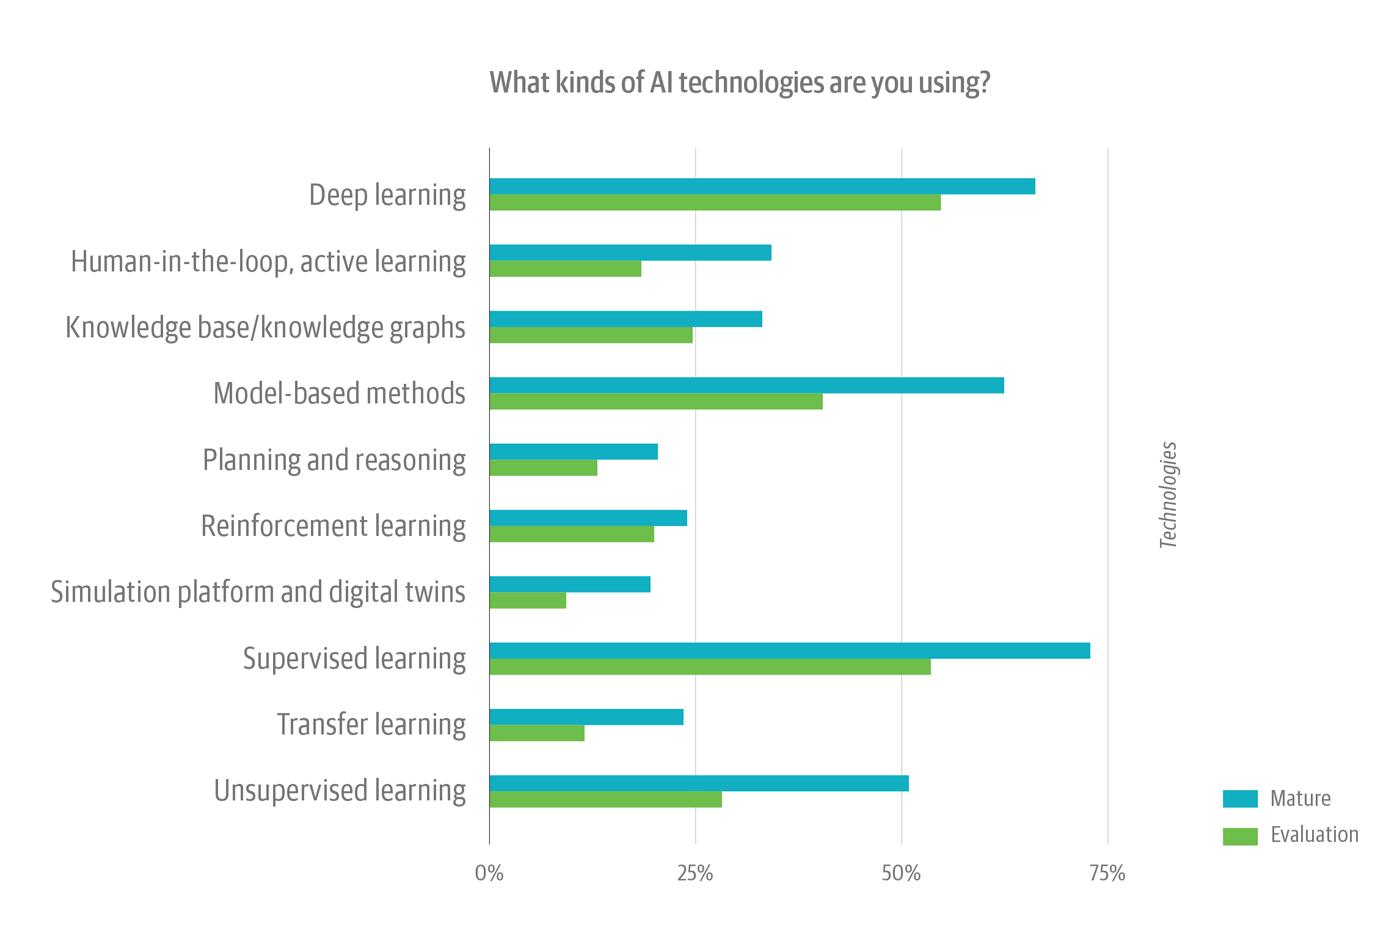 AI technologies organizations are using (with AI adoption maturity level)